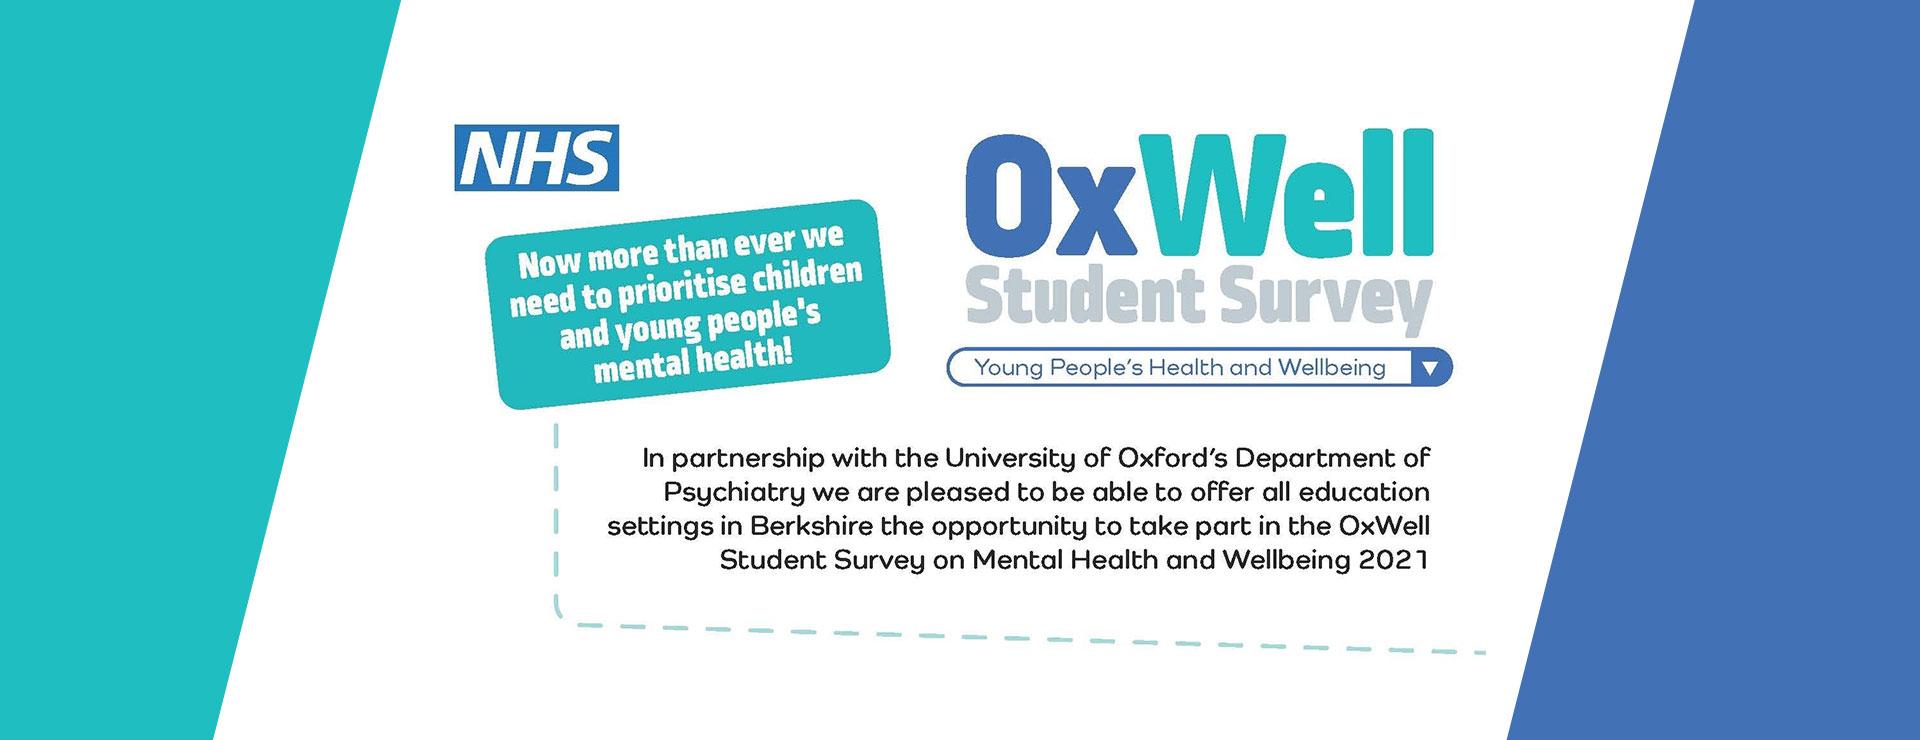 blog-oxwell-student-survey-b